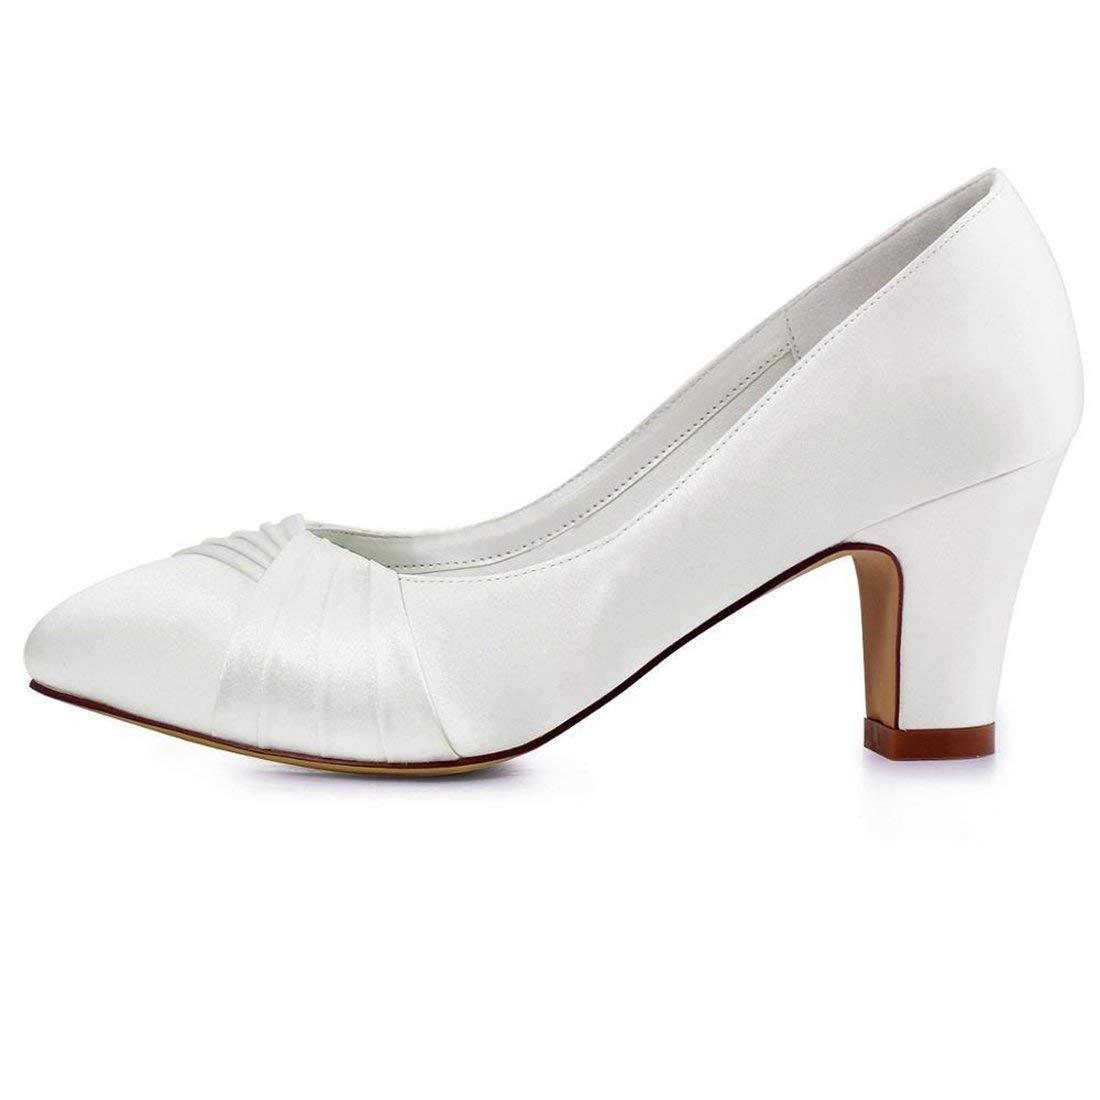 HhGold Damen Knoten Chunky Med Ferse Ferse Ferse Slip-on Weiß Satin Hochzeit Abend Pumps UK 2.5 (Farbe   -, Größe   -) 36f2ca